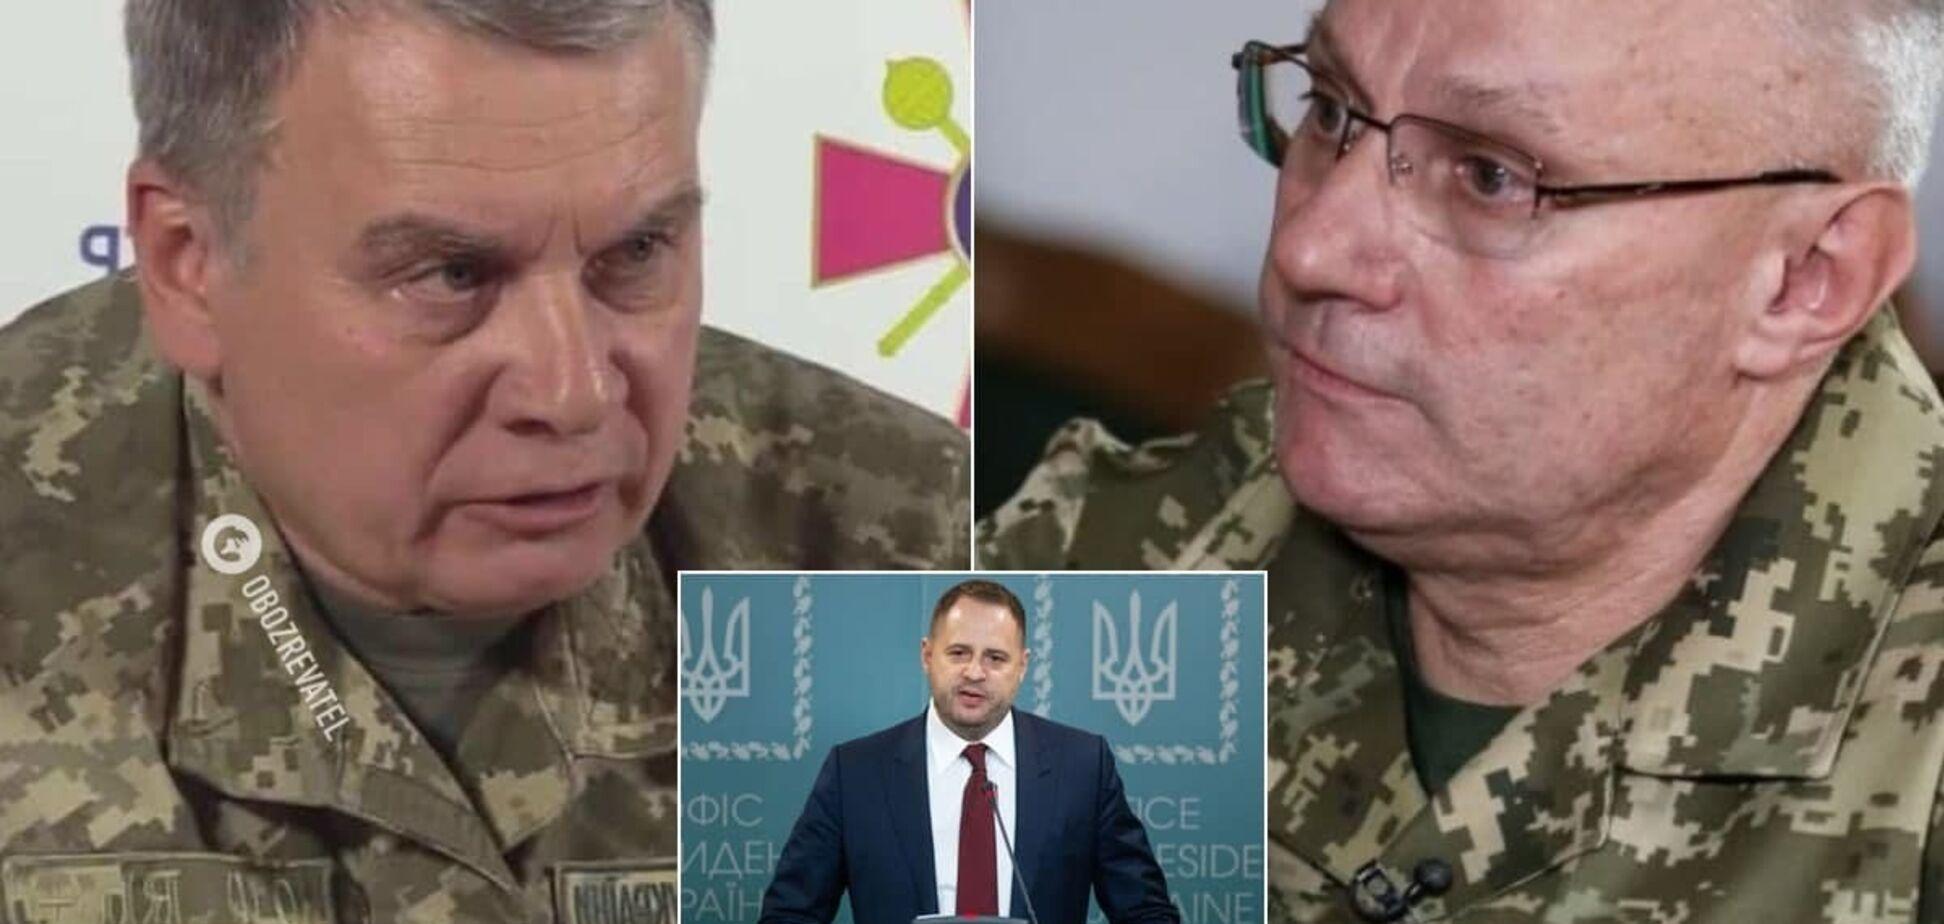 Андрей Таран, Андрей Ермак и Руслан Хомчак